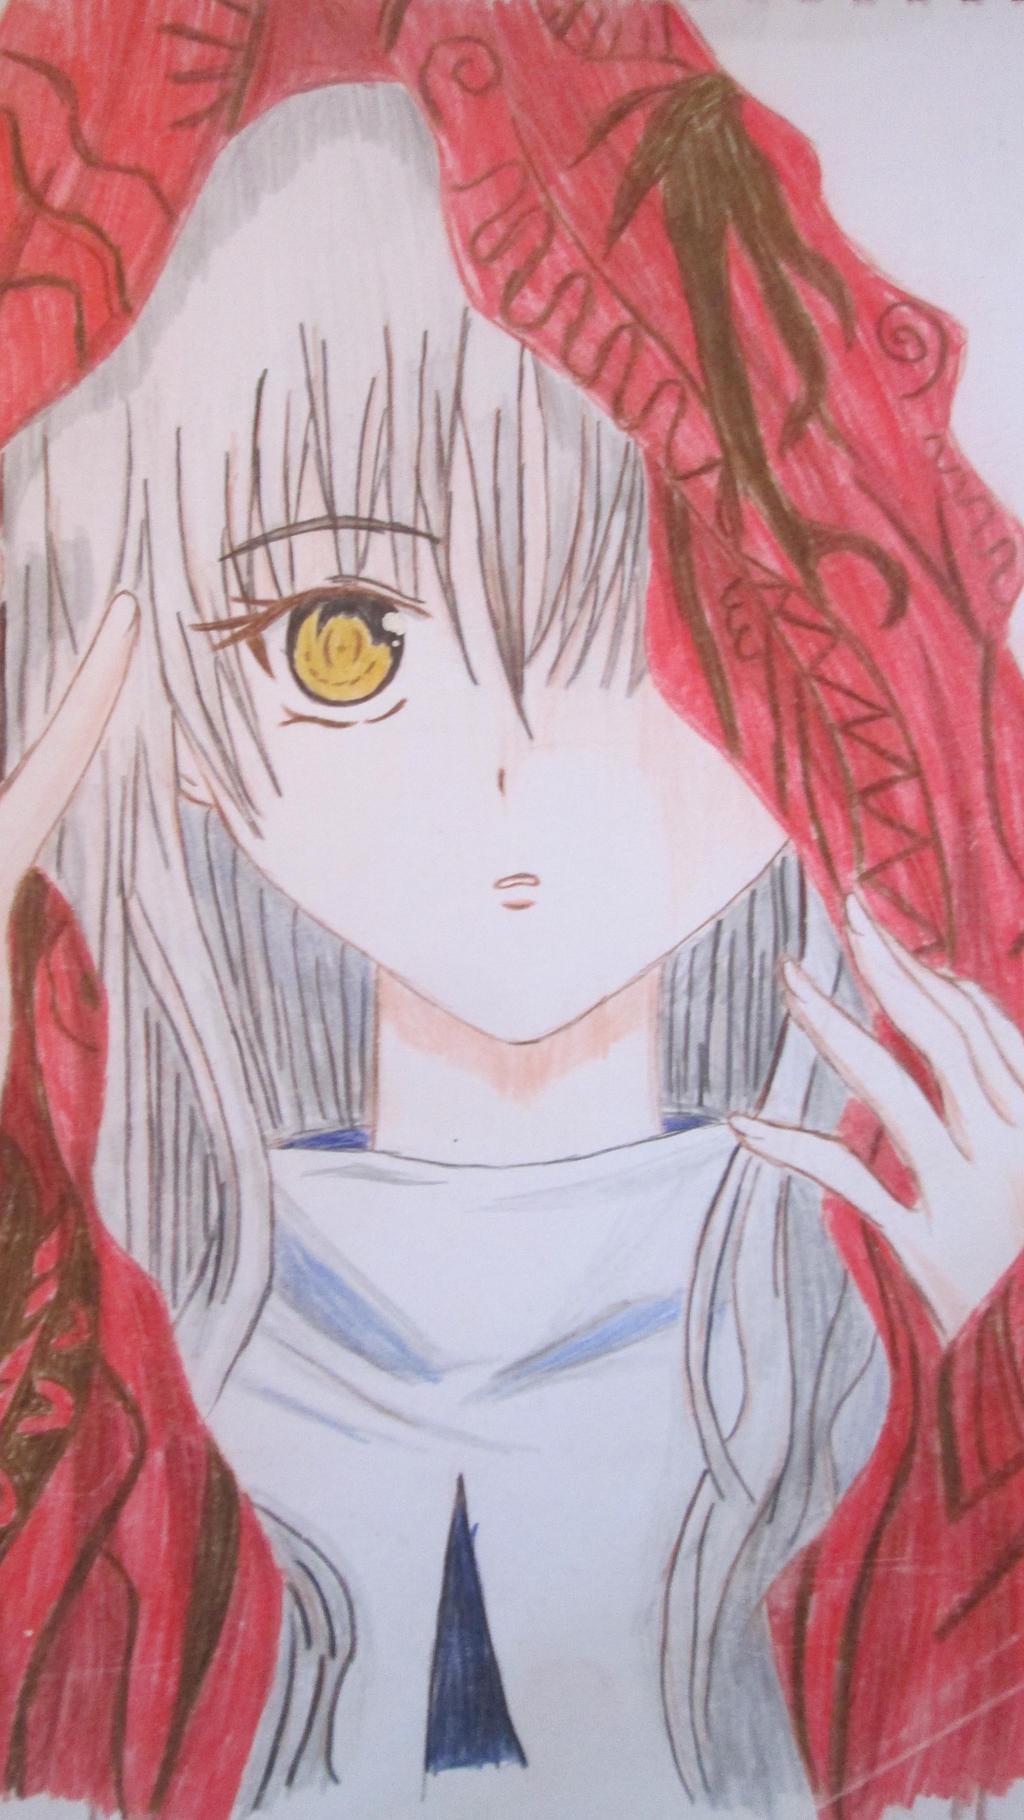 anime vampire girl by mayenlobrigas on deviantart